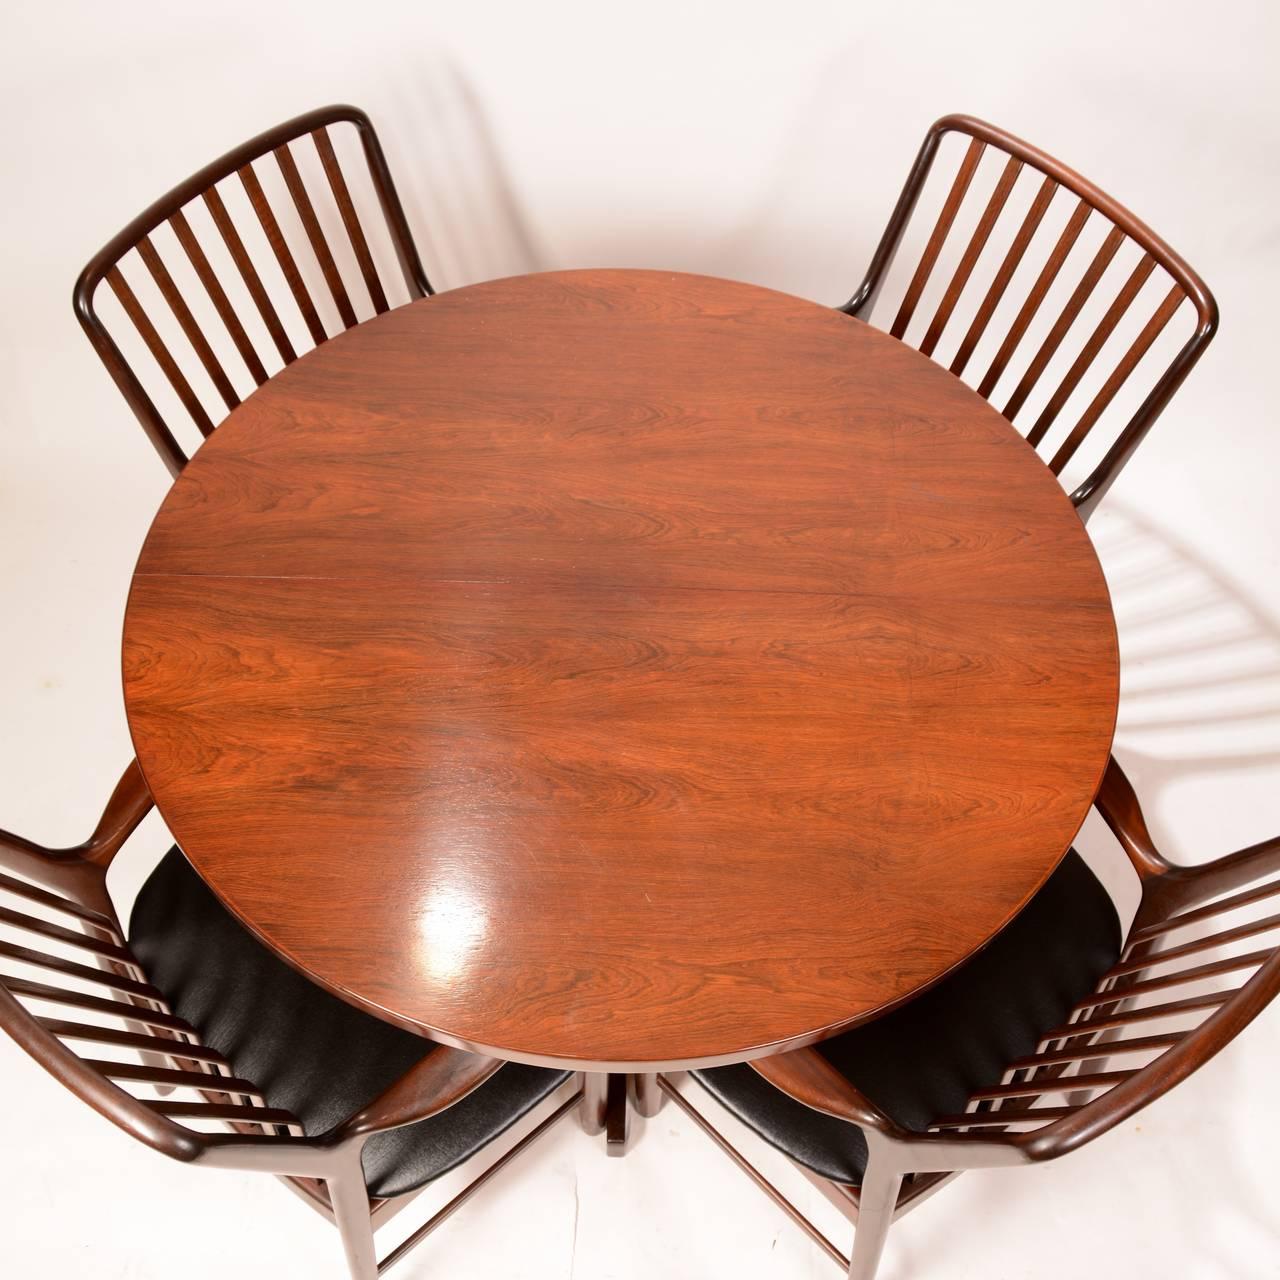 Mid-Century Modern Skovmand & Andersen for Moreddi Rosewood Dining Table 7